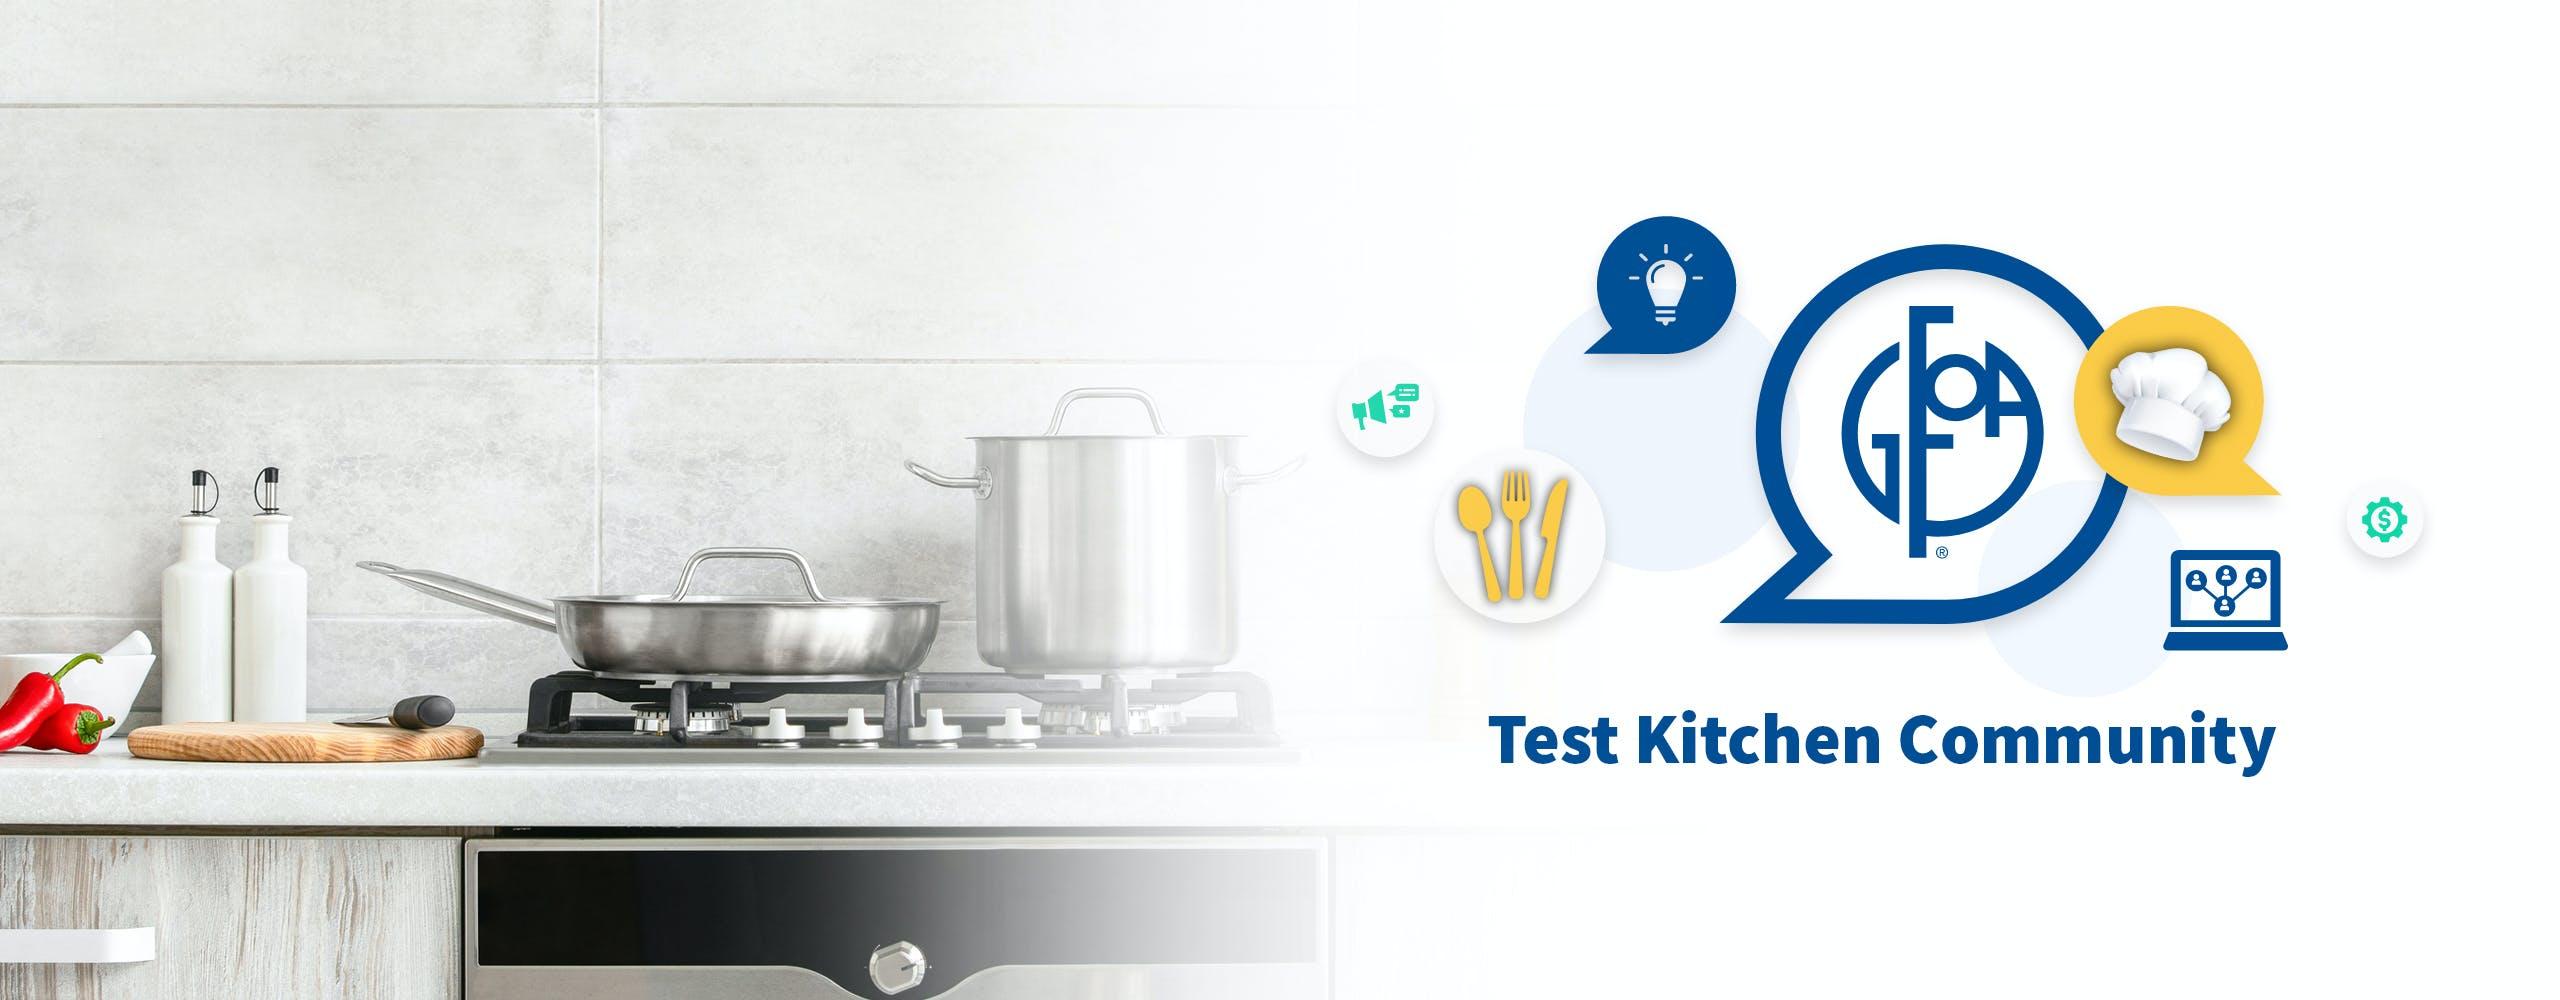 Photo of Kitchen and Test Kitchen Community Logo